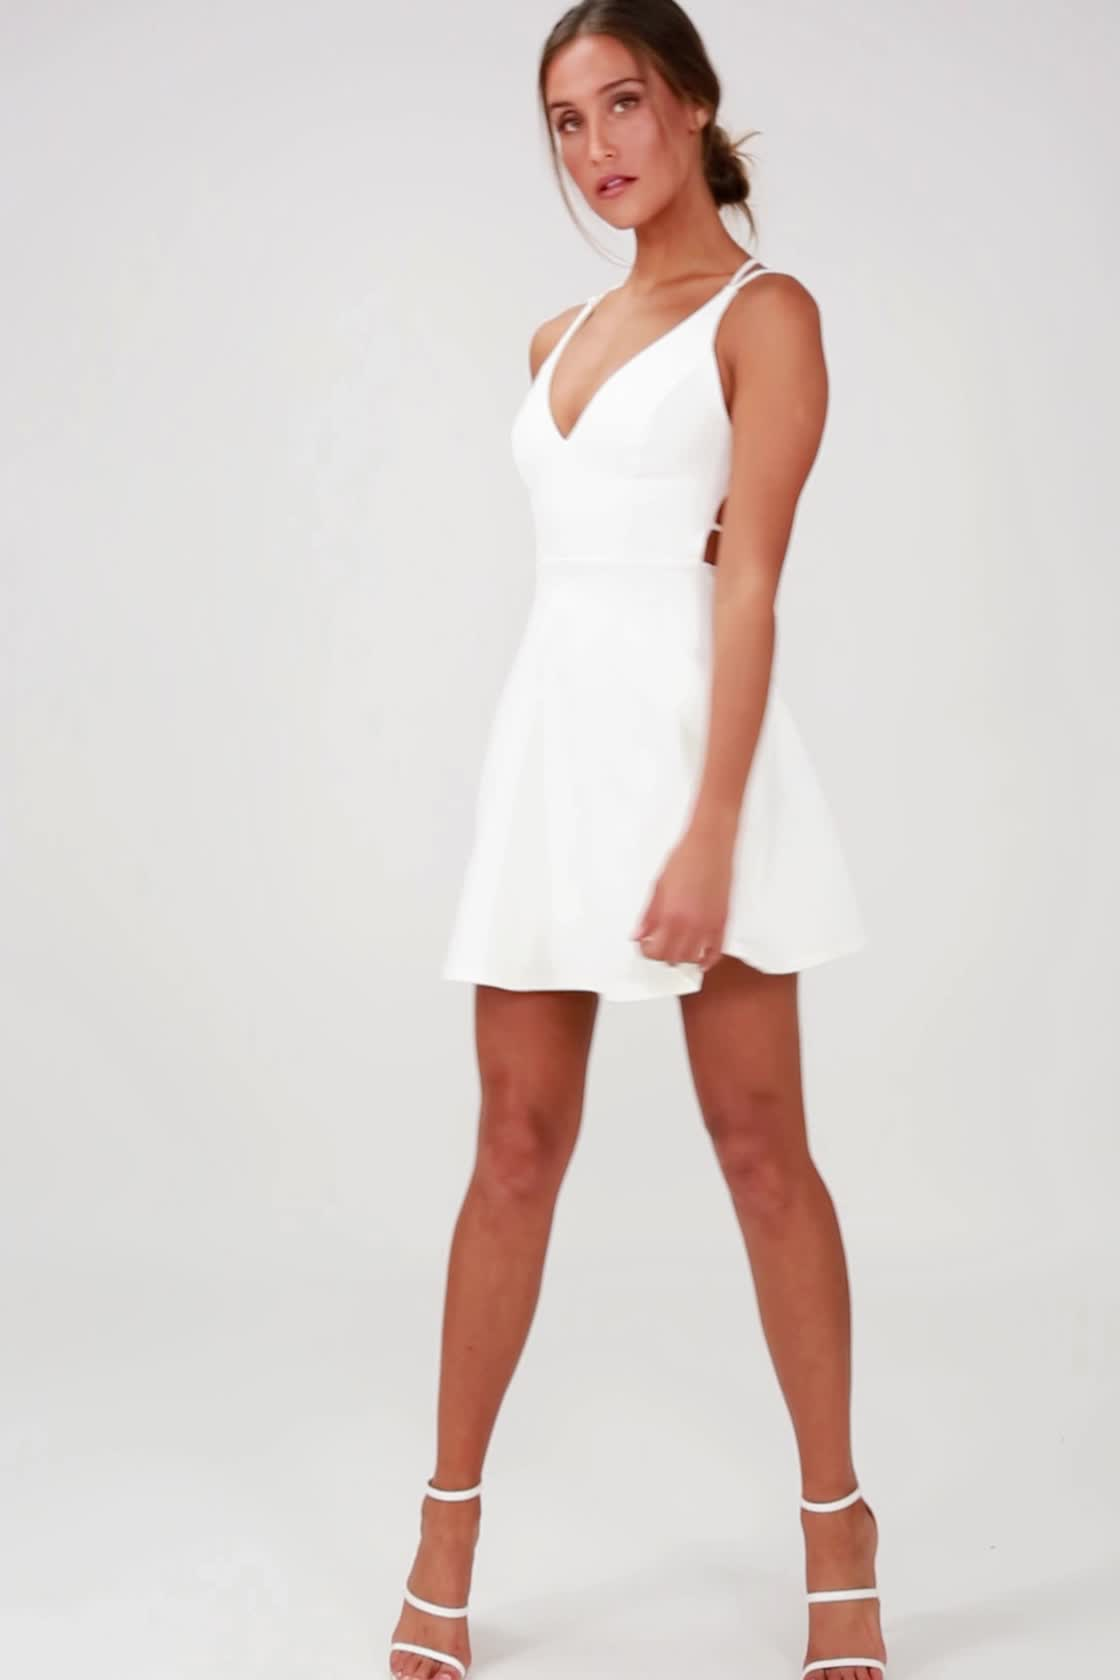 2cc6cd9a54 Sexy Navy Blue Dress - Backless Dress - Backless Skater Dress